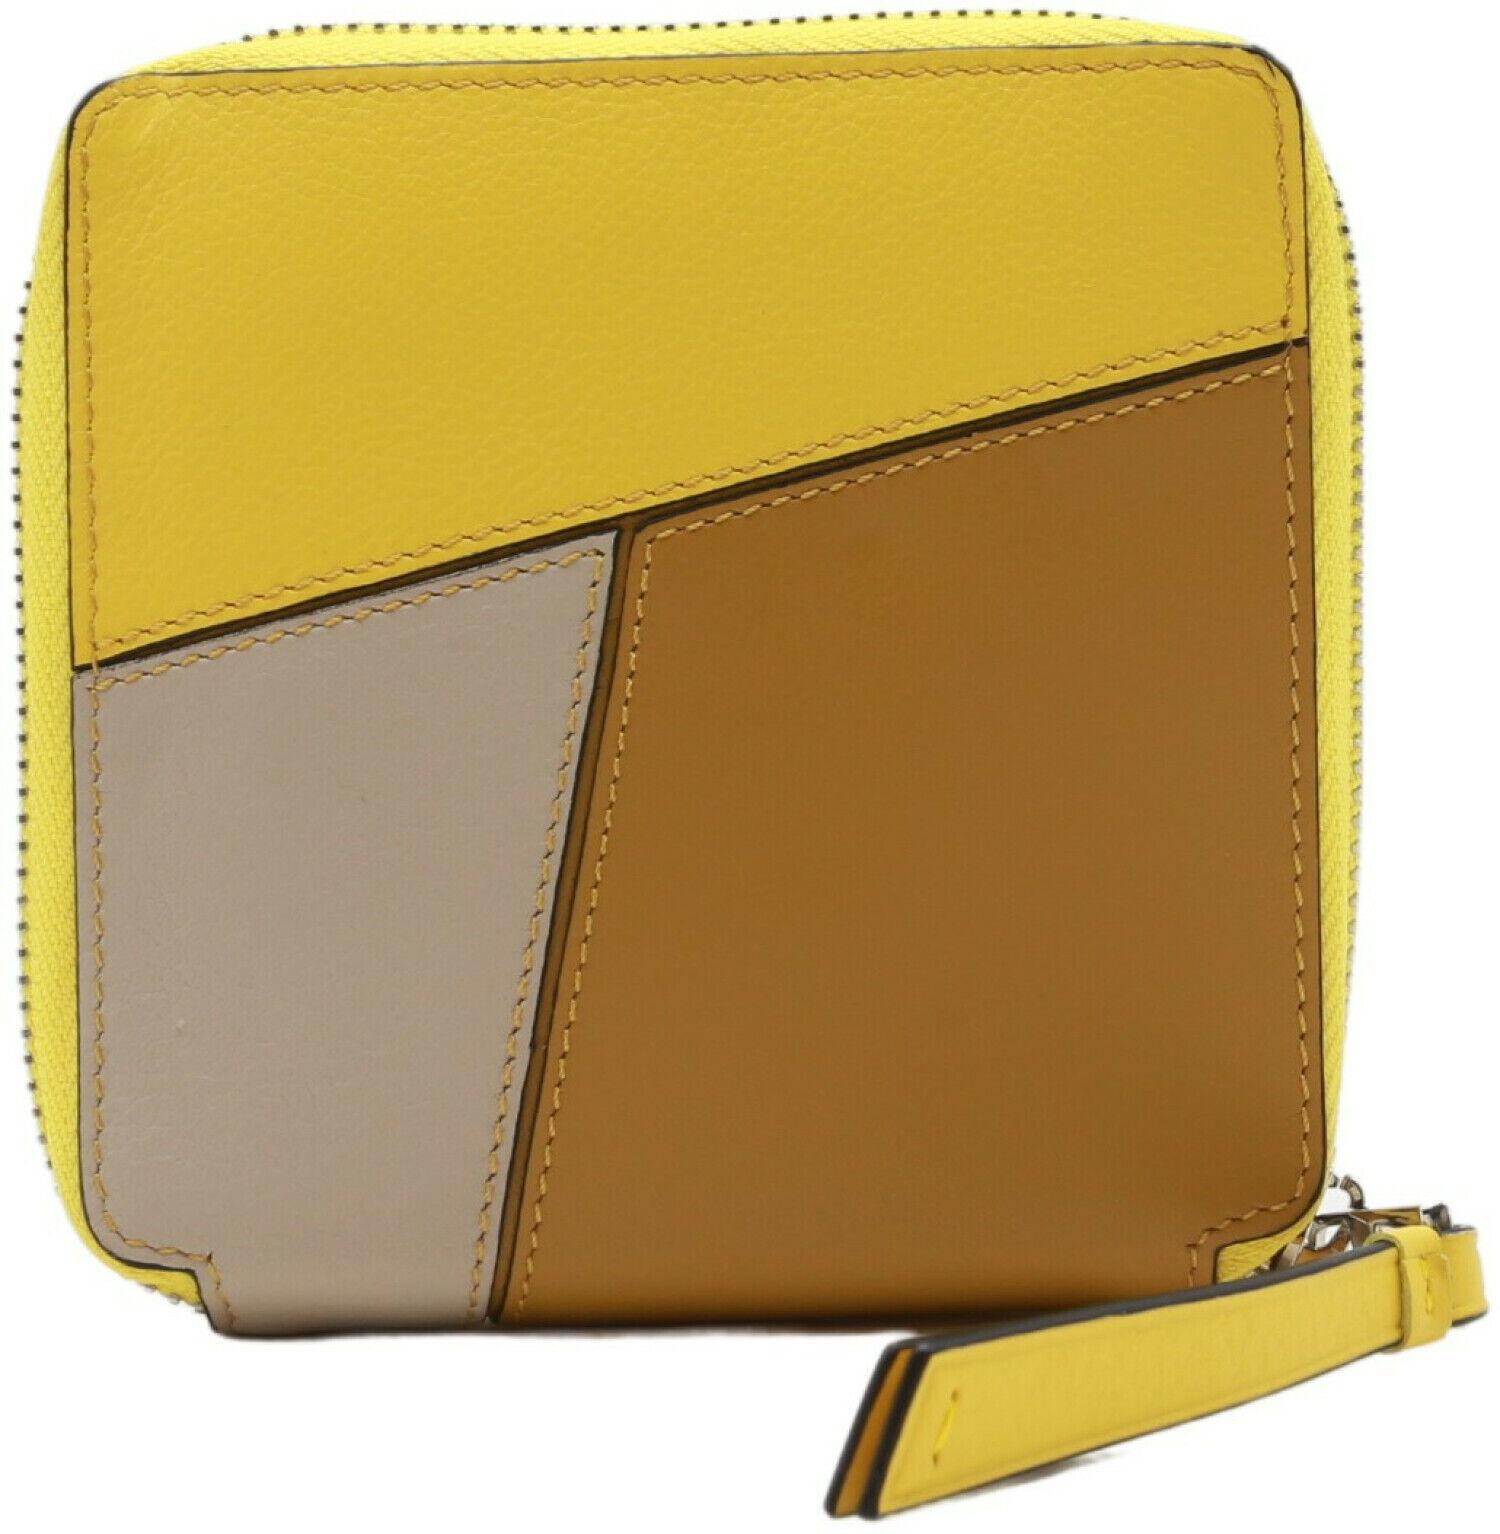 Loewe Women's Puzzle Square Zip Leather Wallet